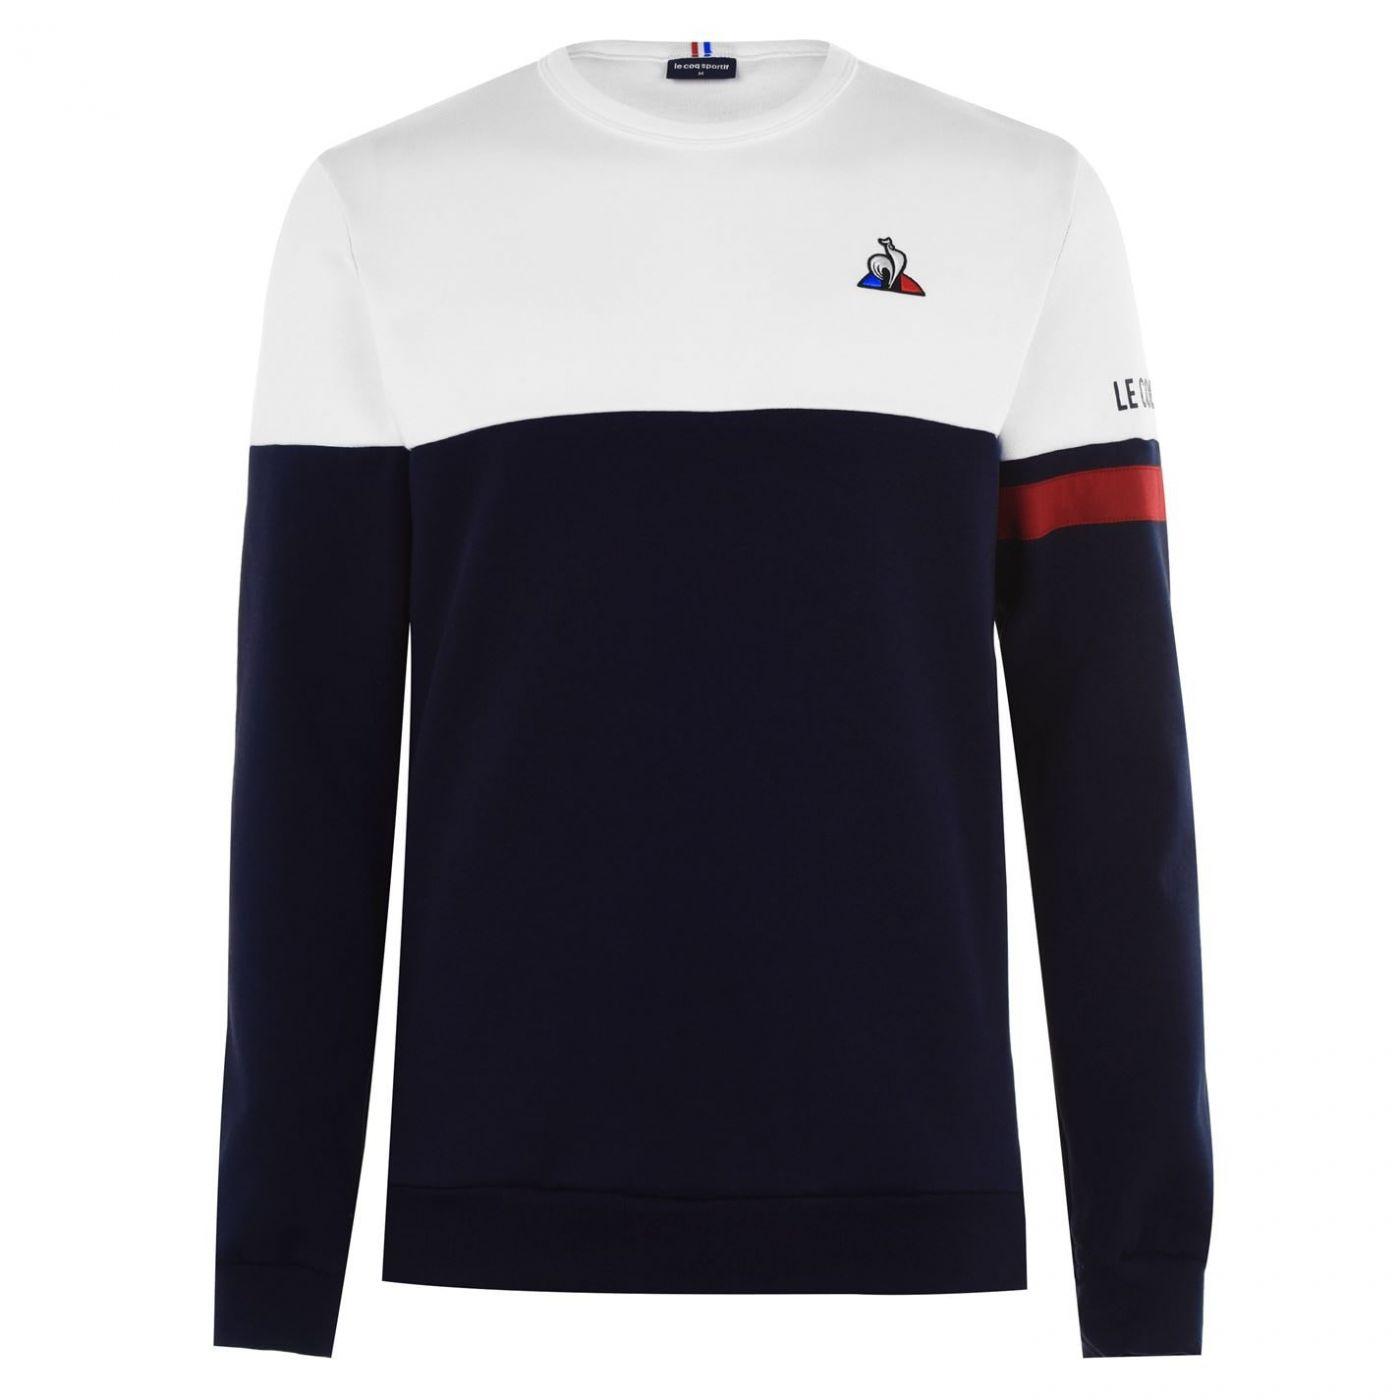 Le Coq Sportif Sportif Sweater